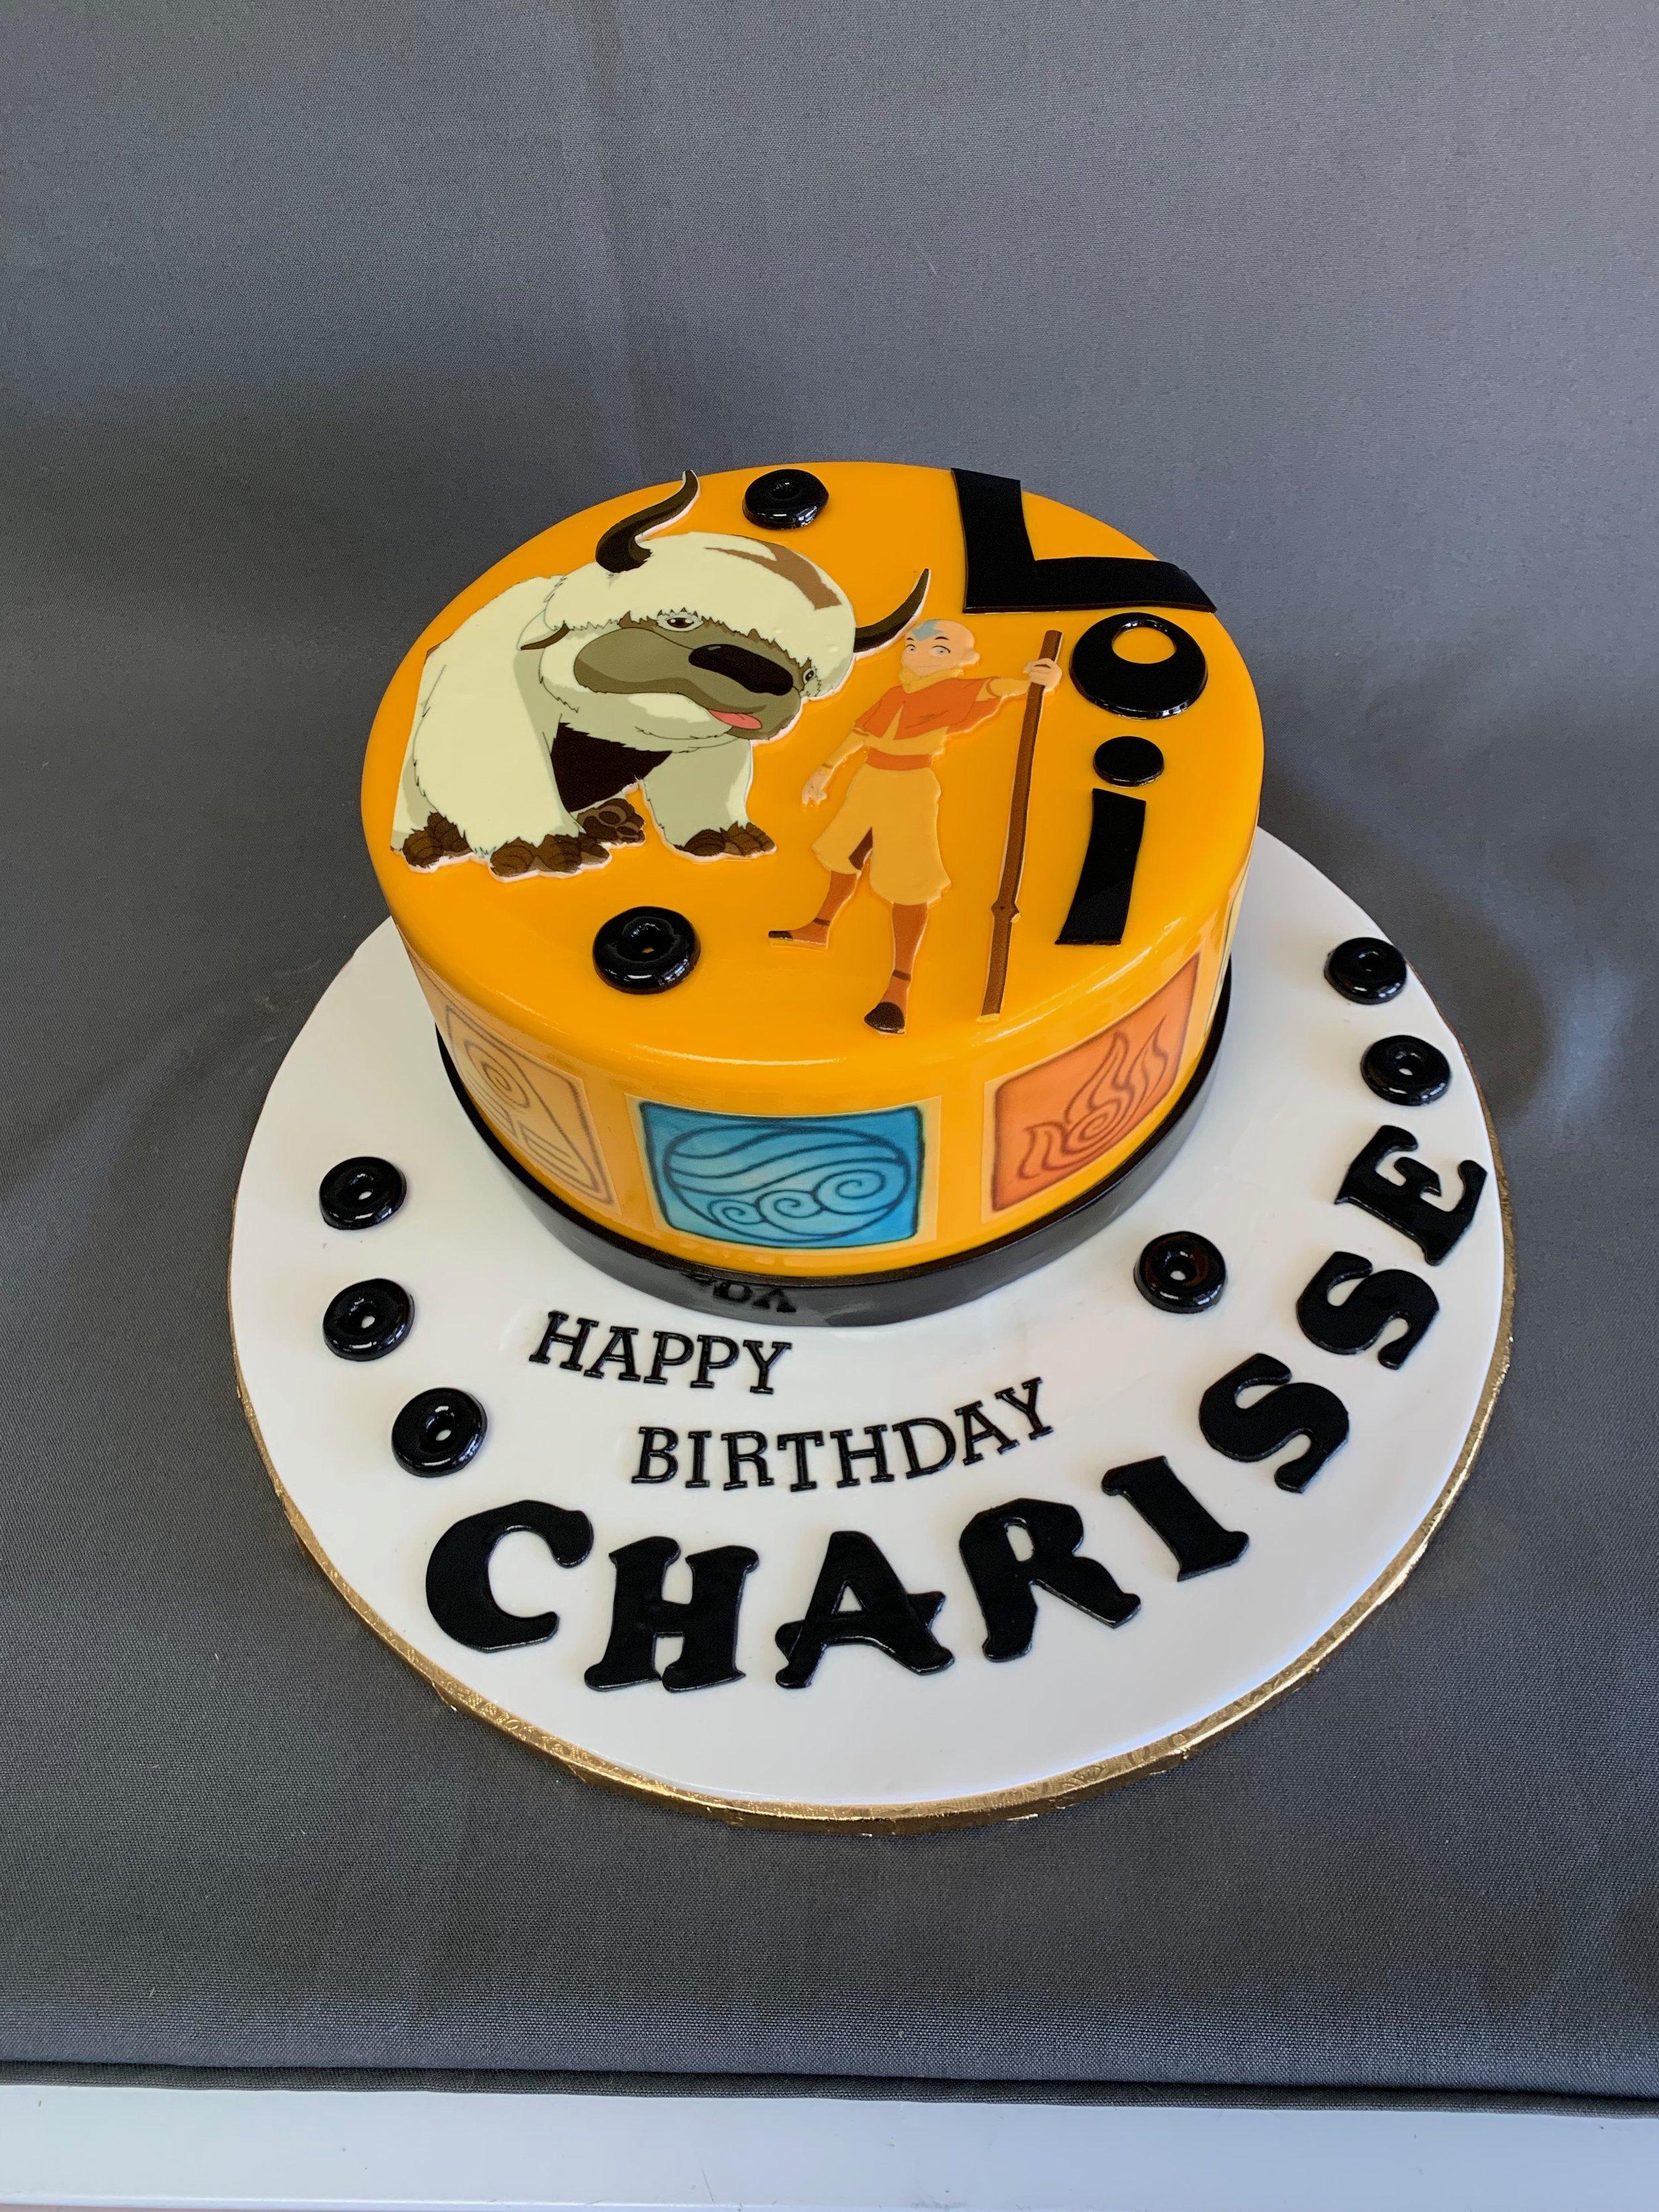 The Last Air Bender Birthday Cake